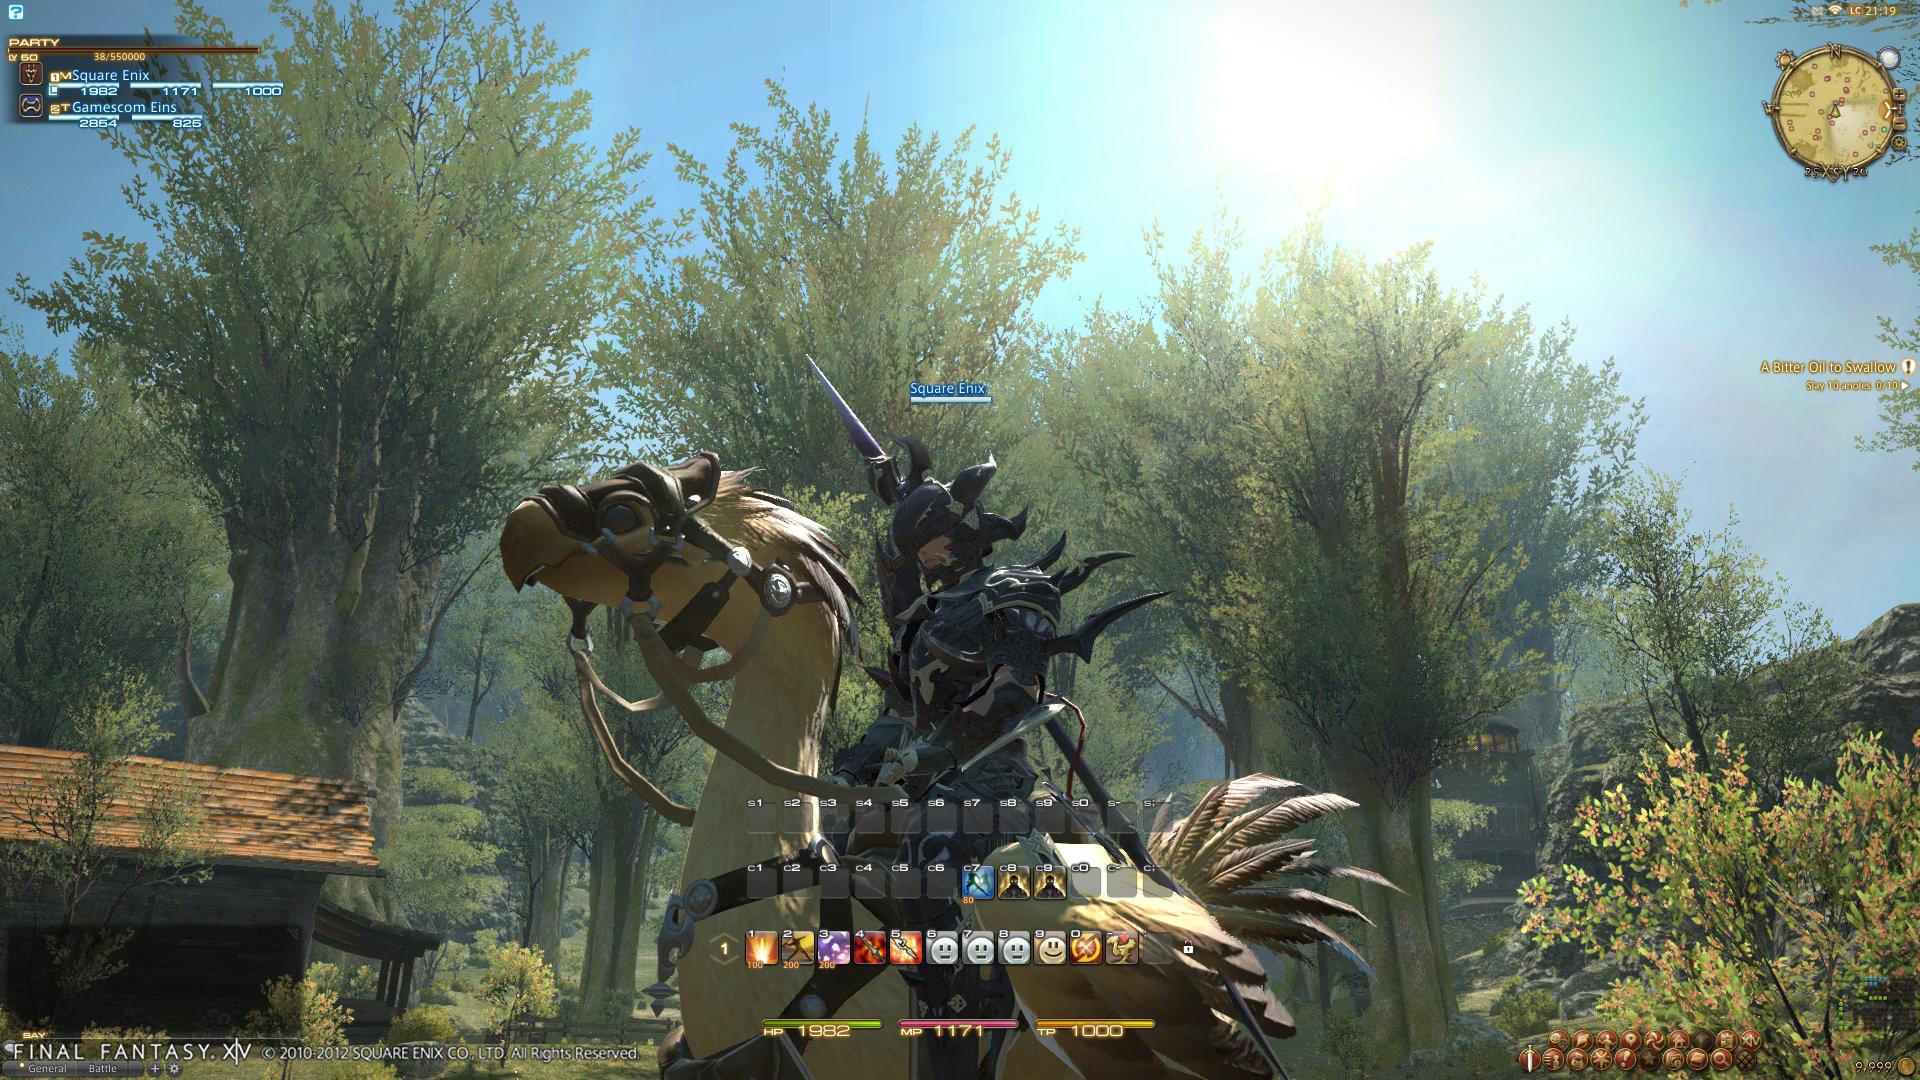 Video Game – Final Fantasy XIV: A Realm Reborn Wallpaper